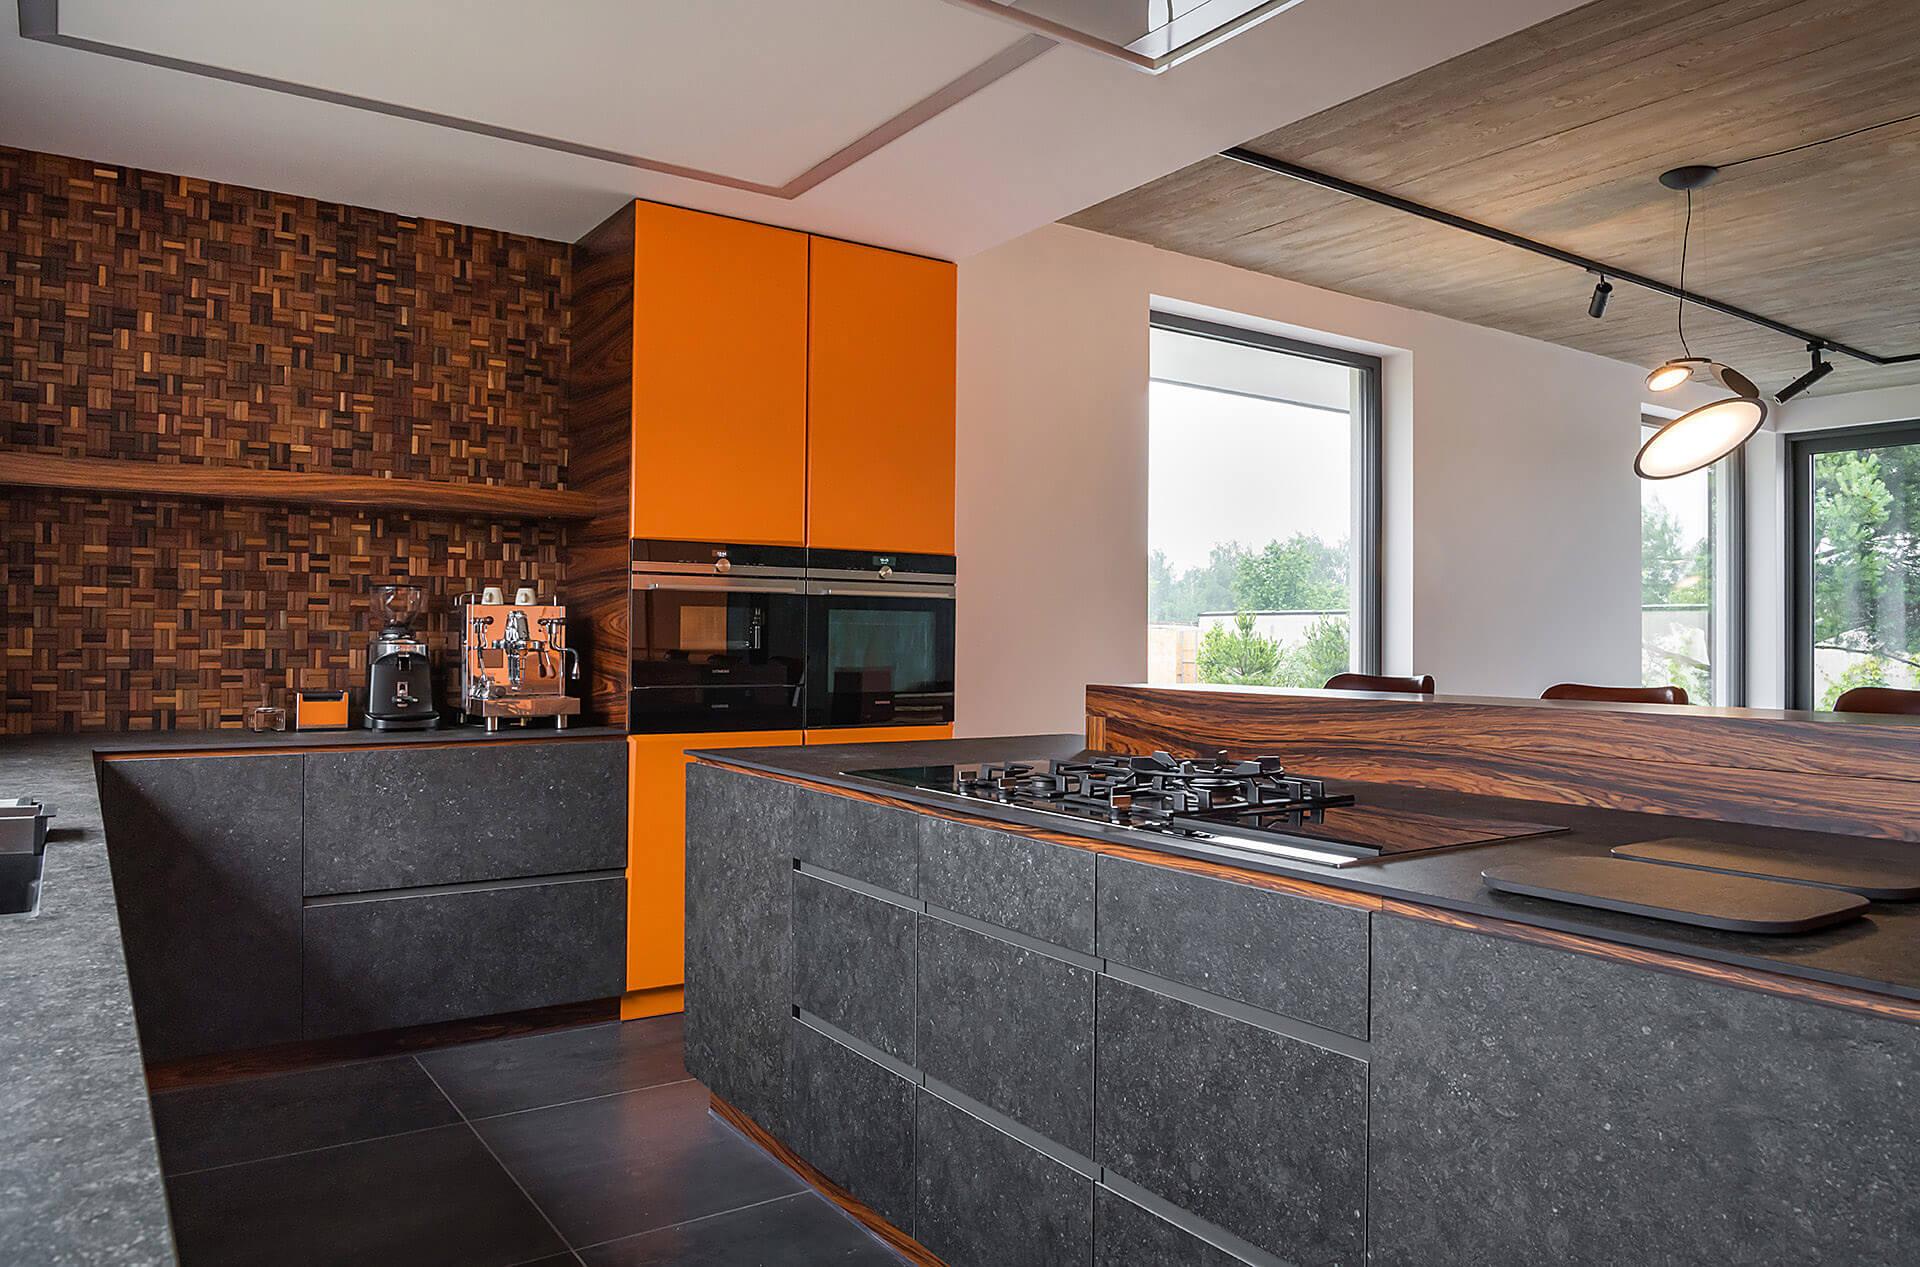 Interior design_Alicja Galewska_wnetrzagalewska.pl Grespania Bluestone at the kitchen front (4)